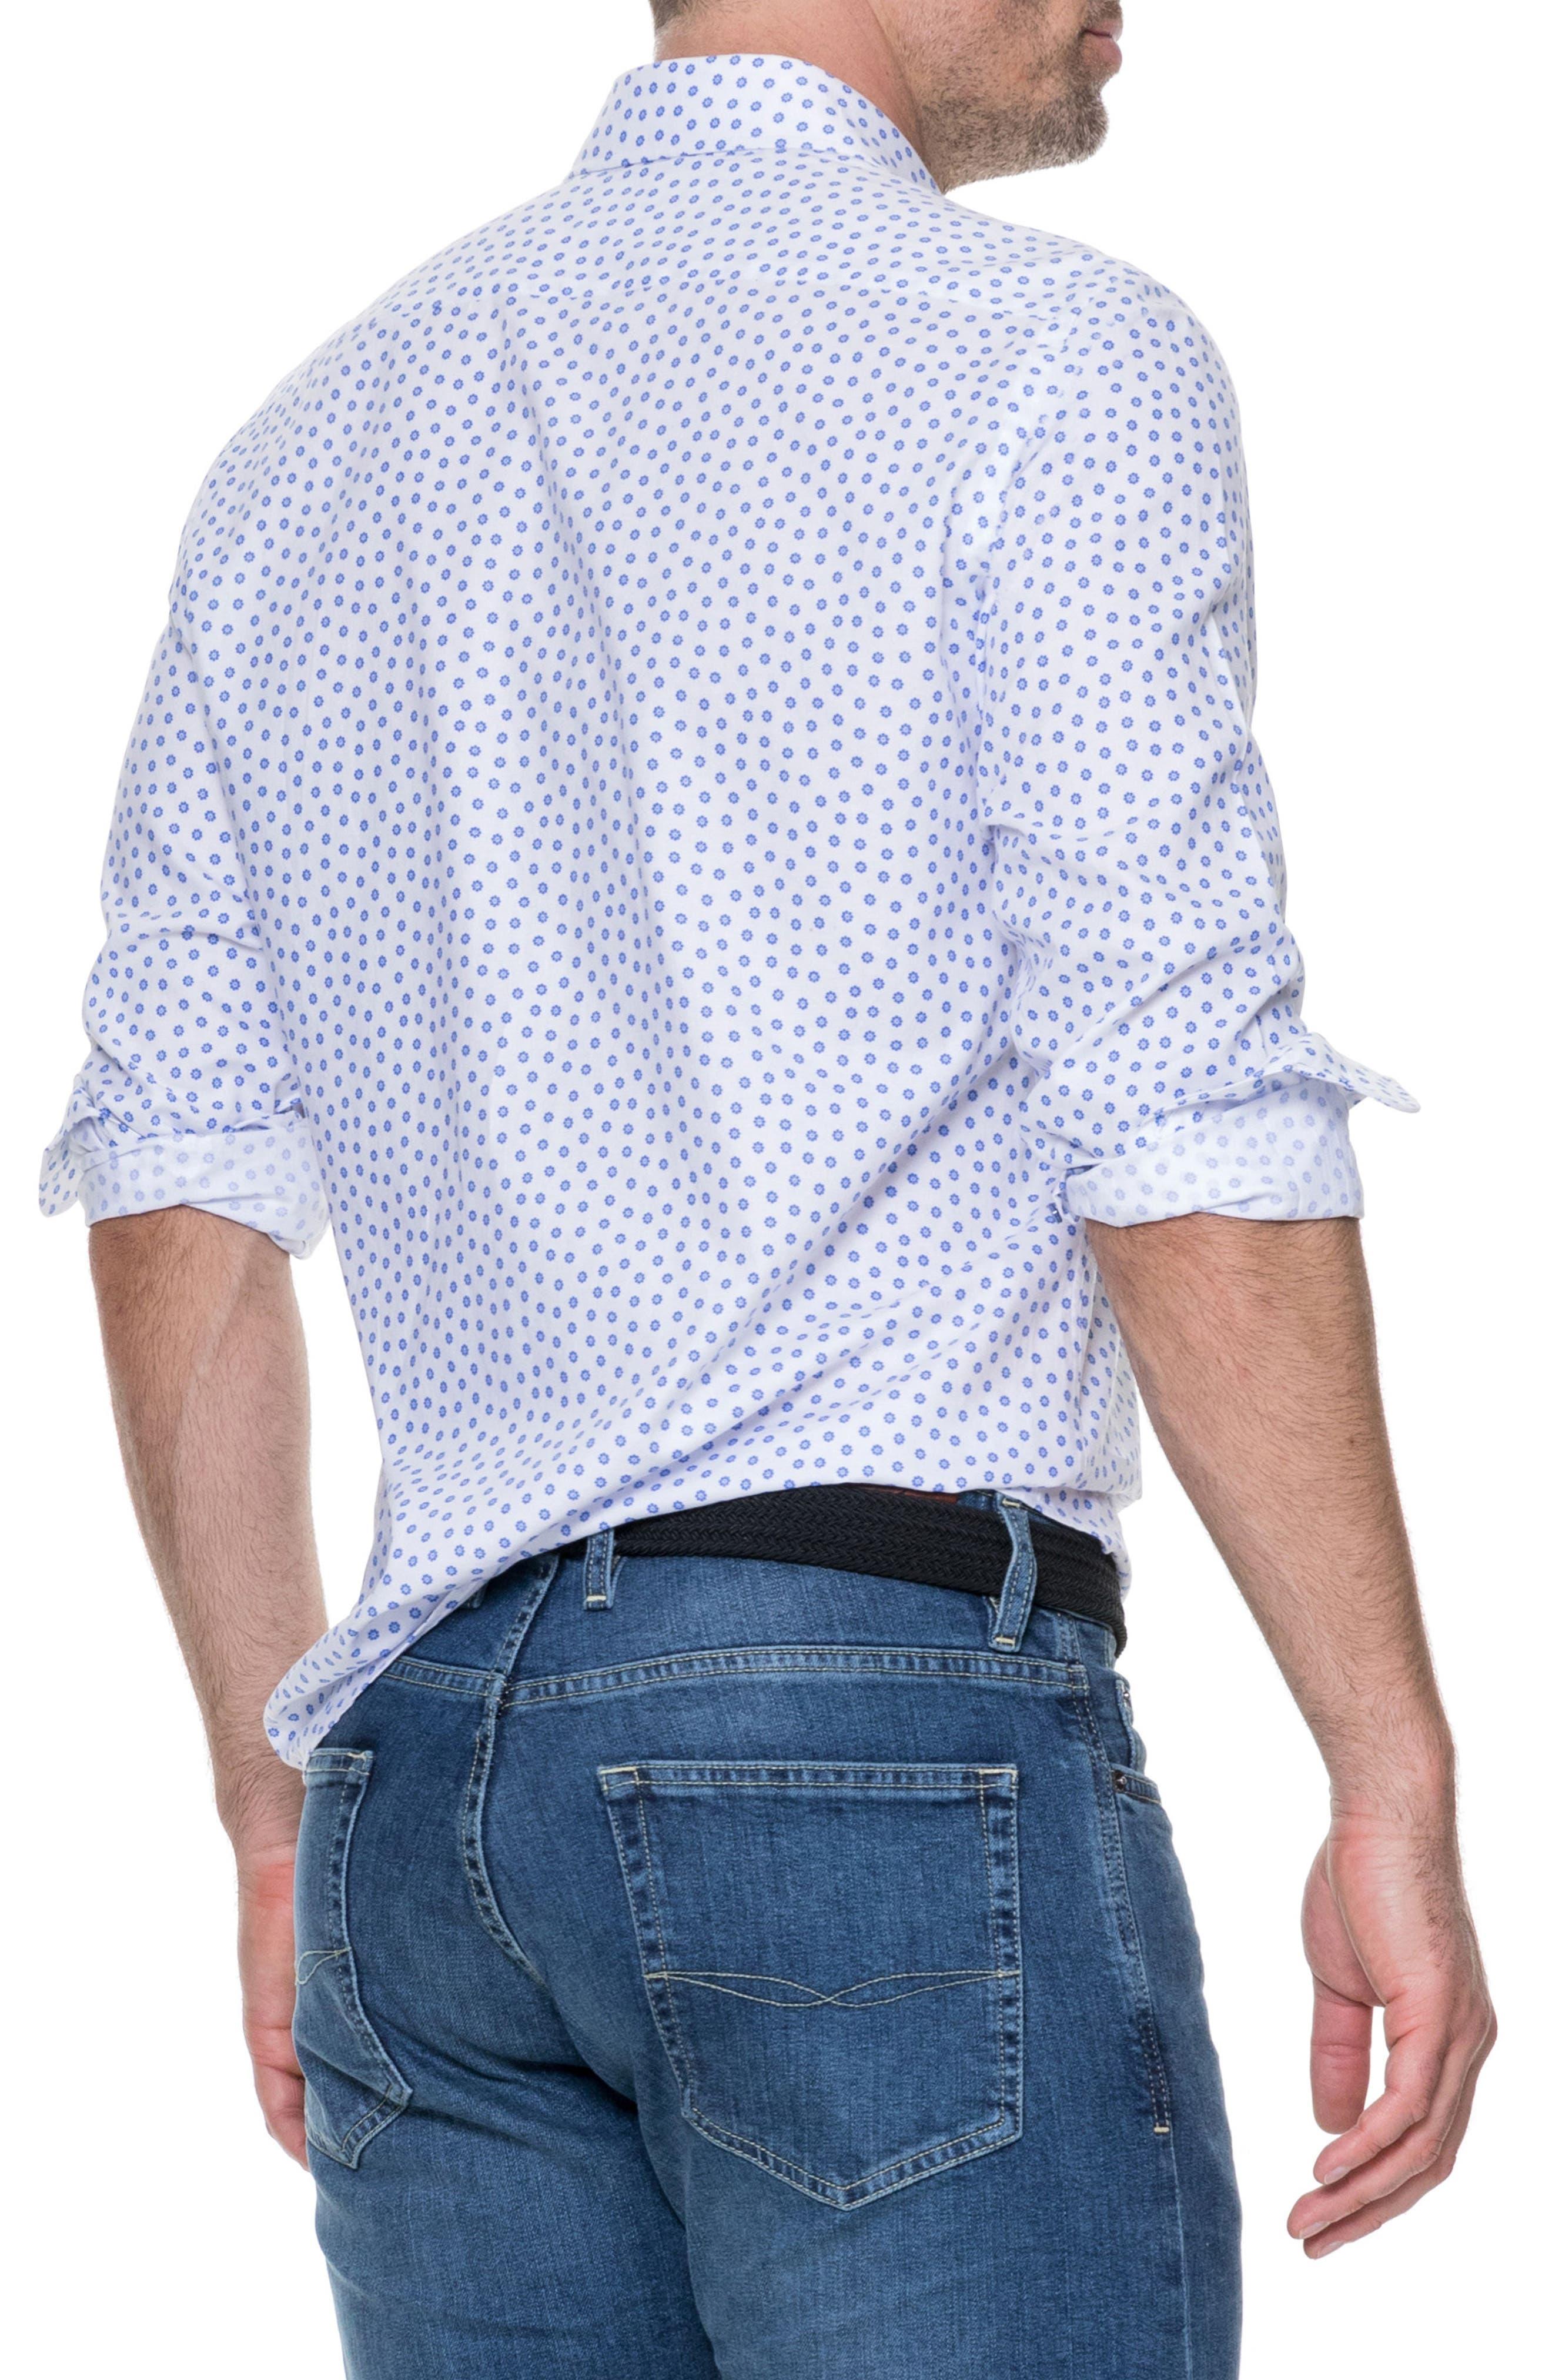 RODD & GUNN,                             Drummond Regular Fit Sport Shirt,                             Alternate thumbnail 2, color,                             111